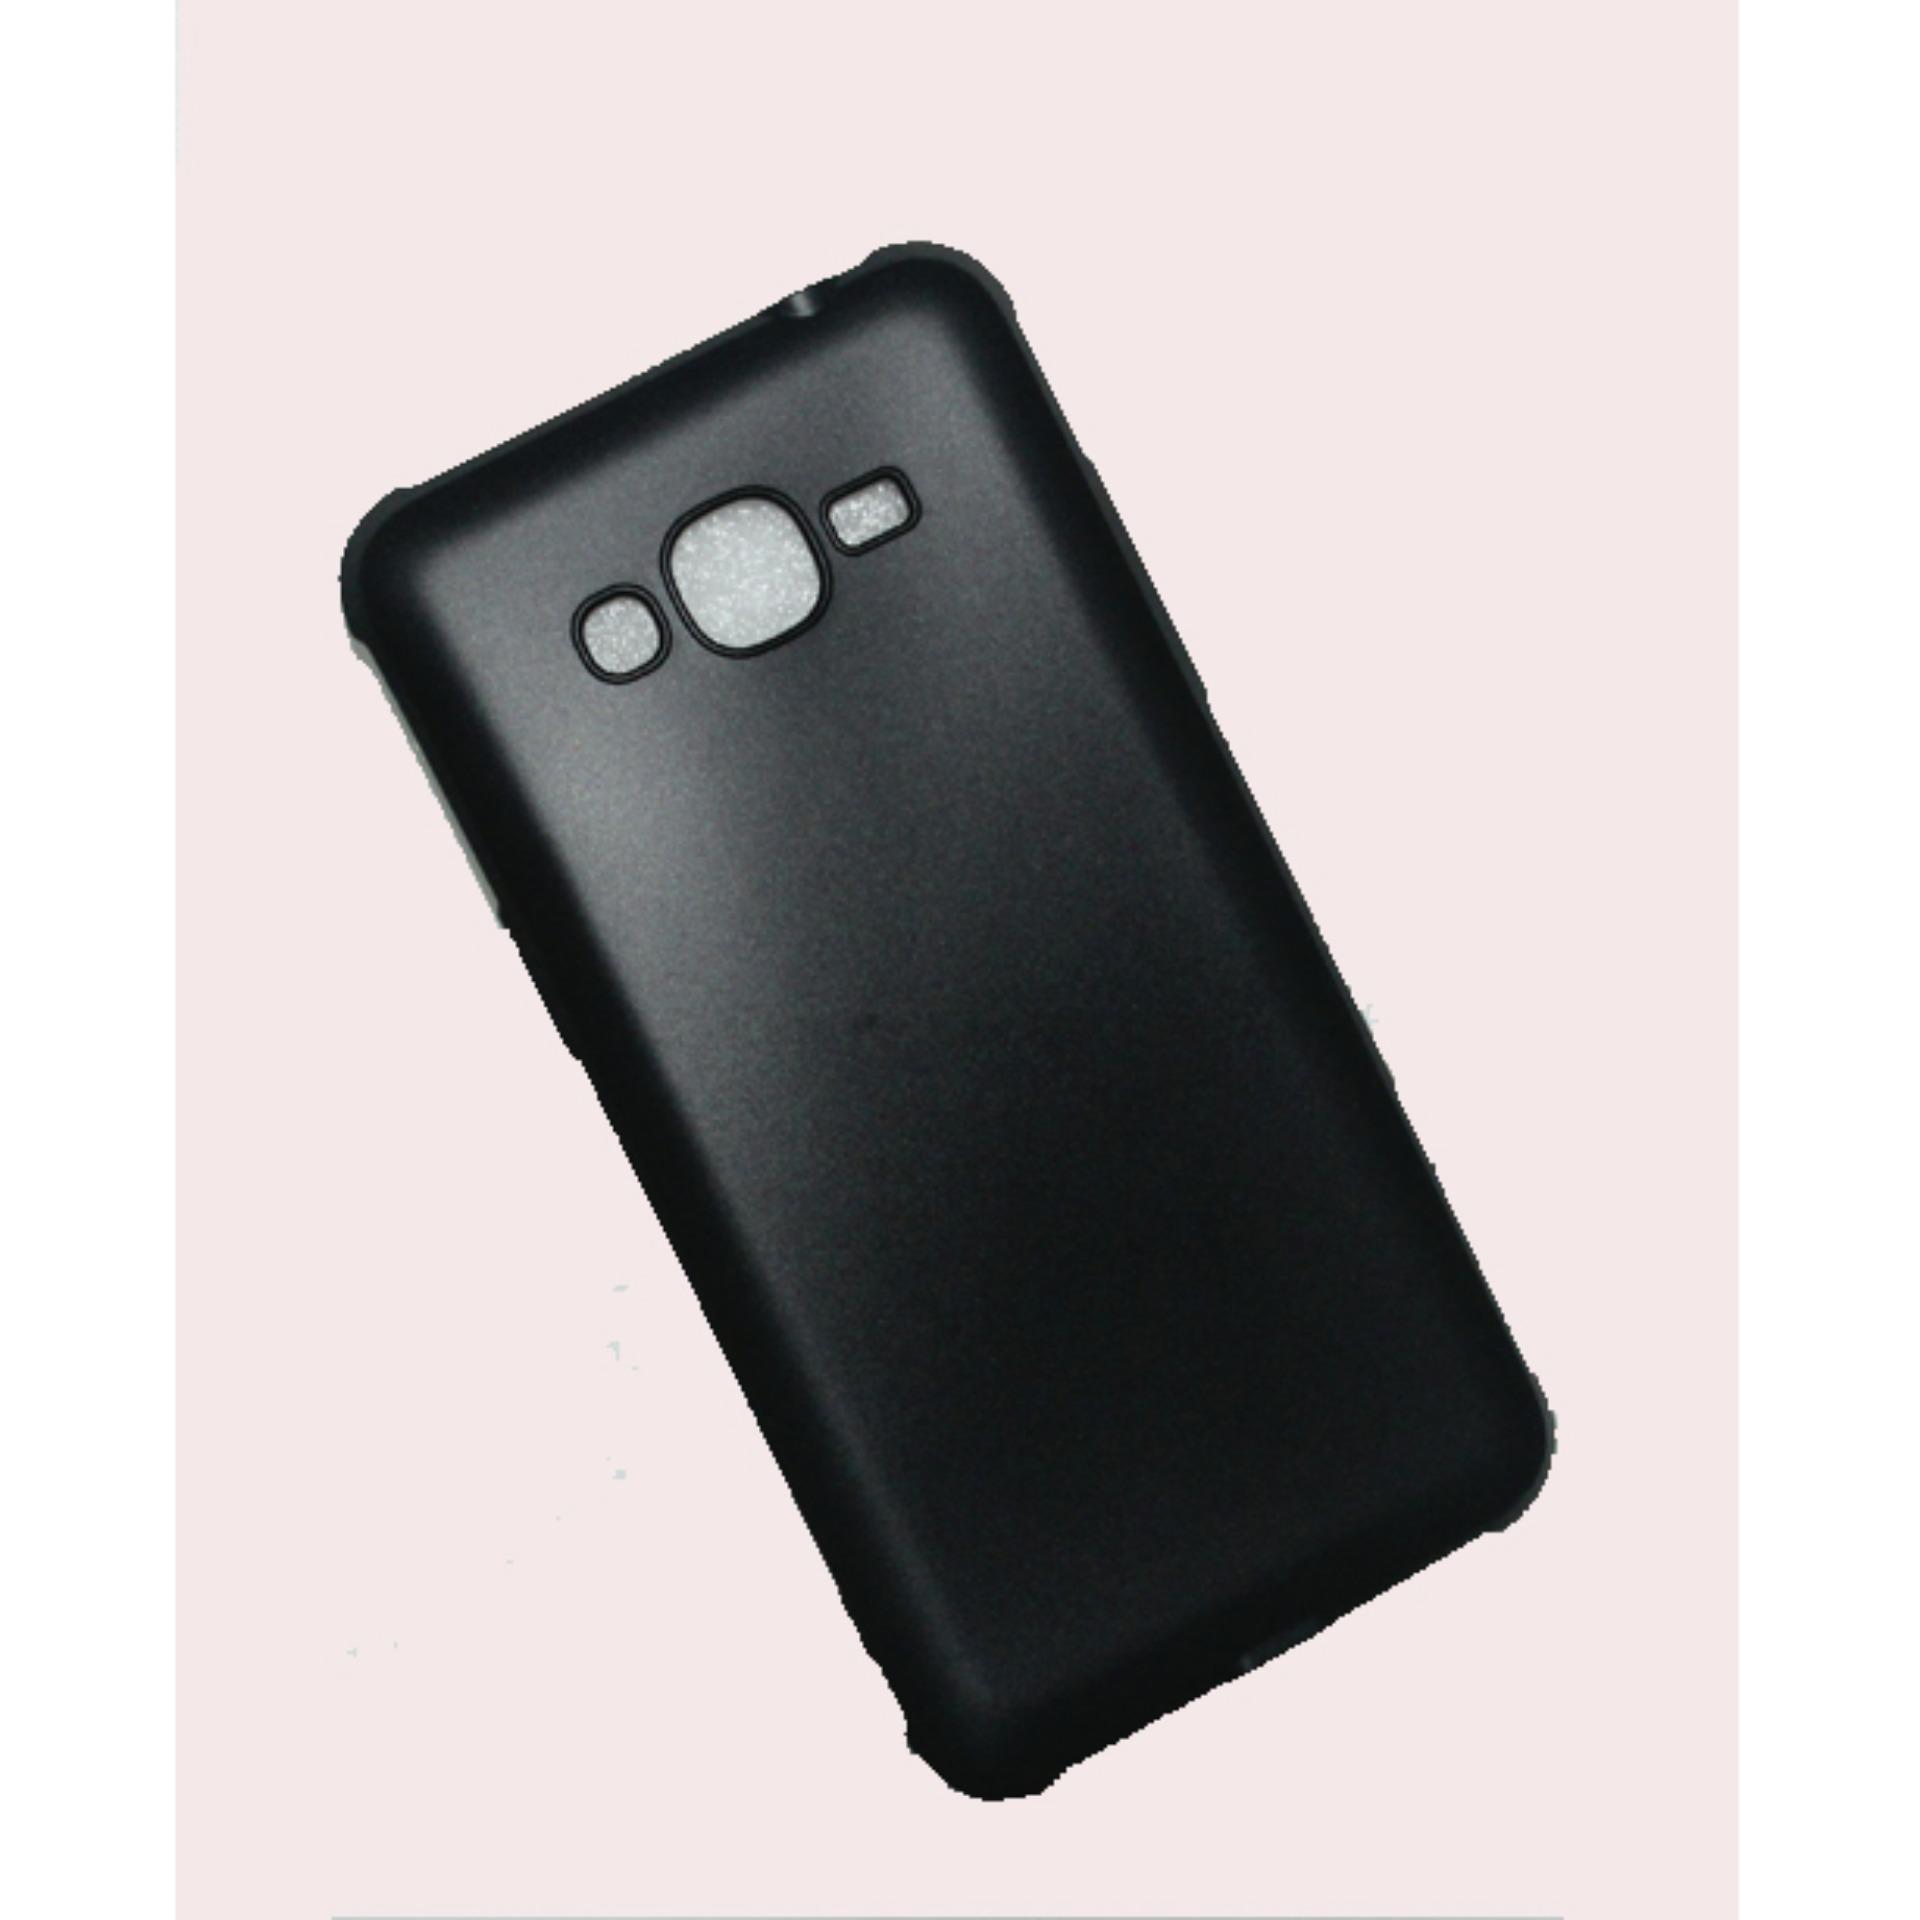 Anti Crack Shock Proof Softcase Silicone For Samsung Galaxy J2 Wanky Silikon Prime Barokah Premium Slim Black Matte Shockproof Case Sm